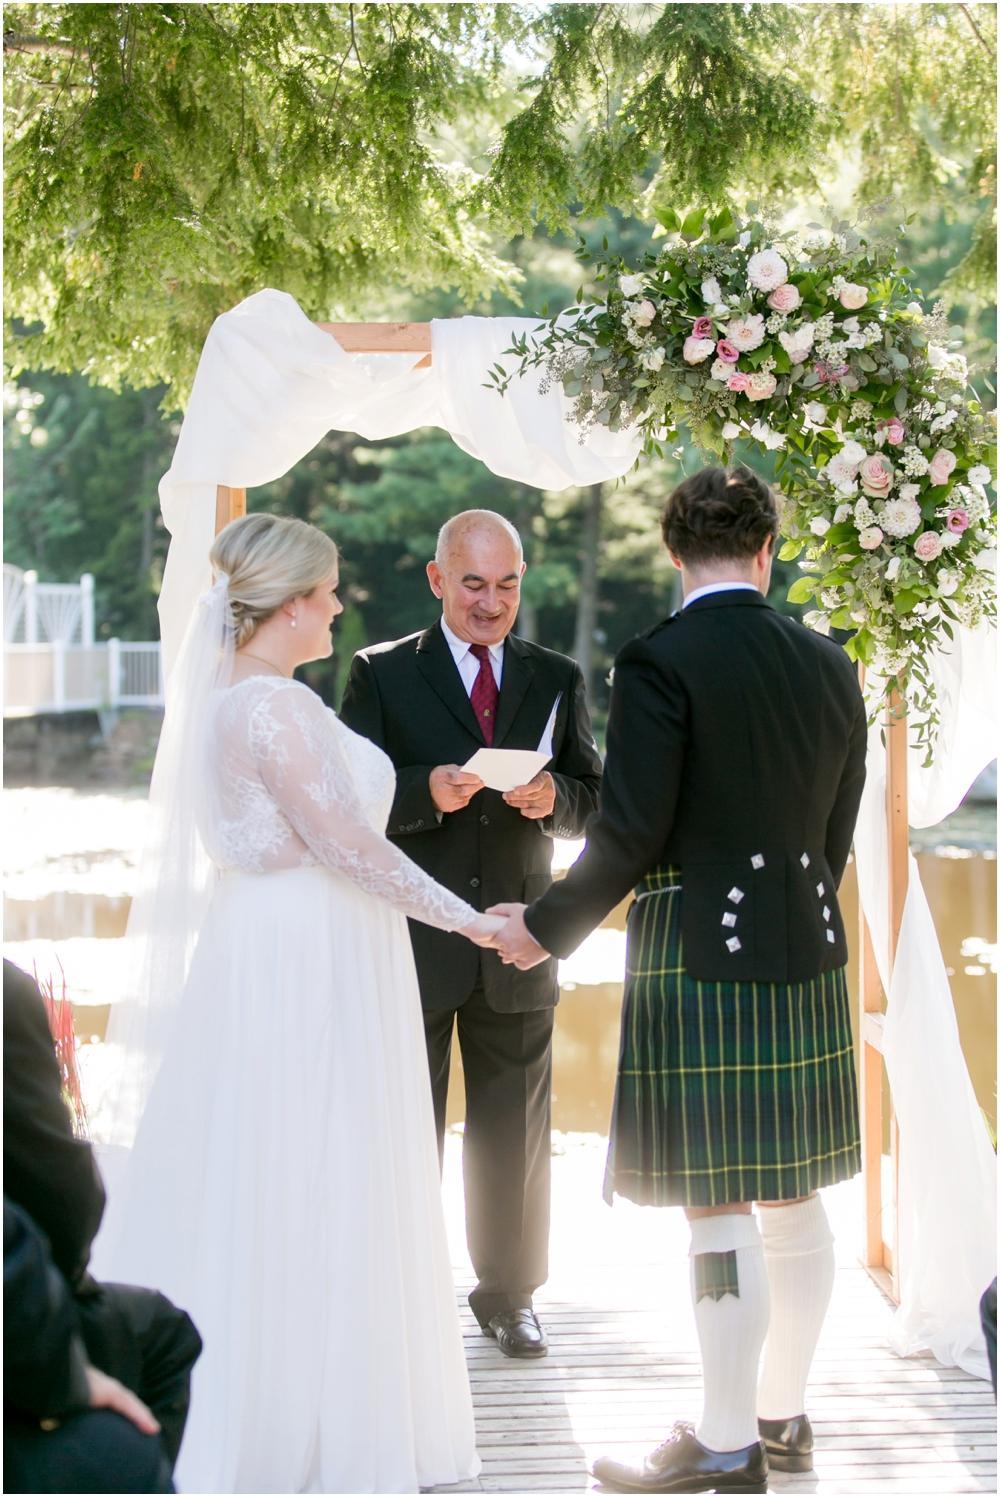 Halifax-Wedding-Chantal-Ruthier-Photography_0006.jpg